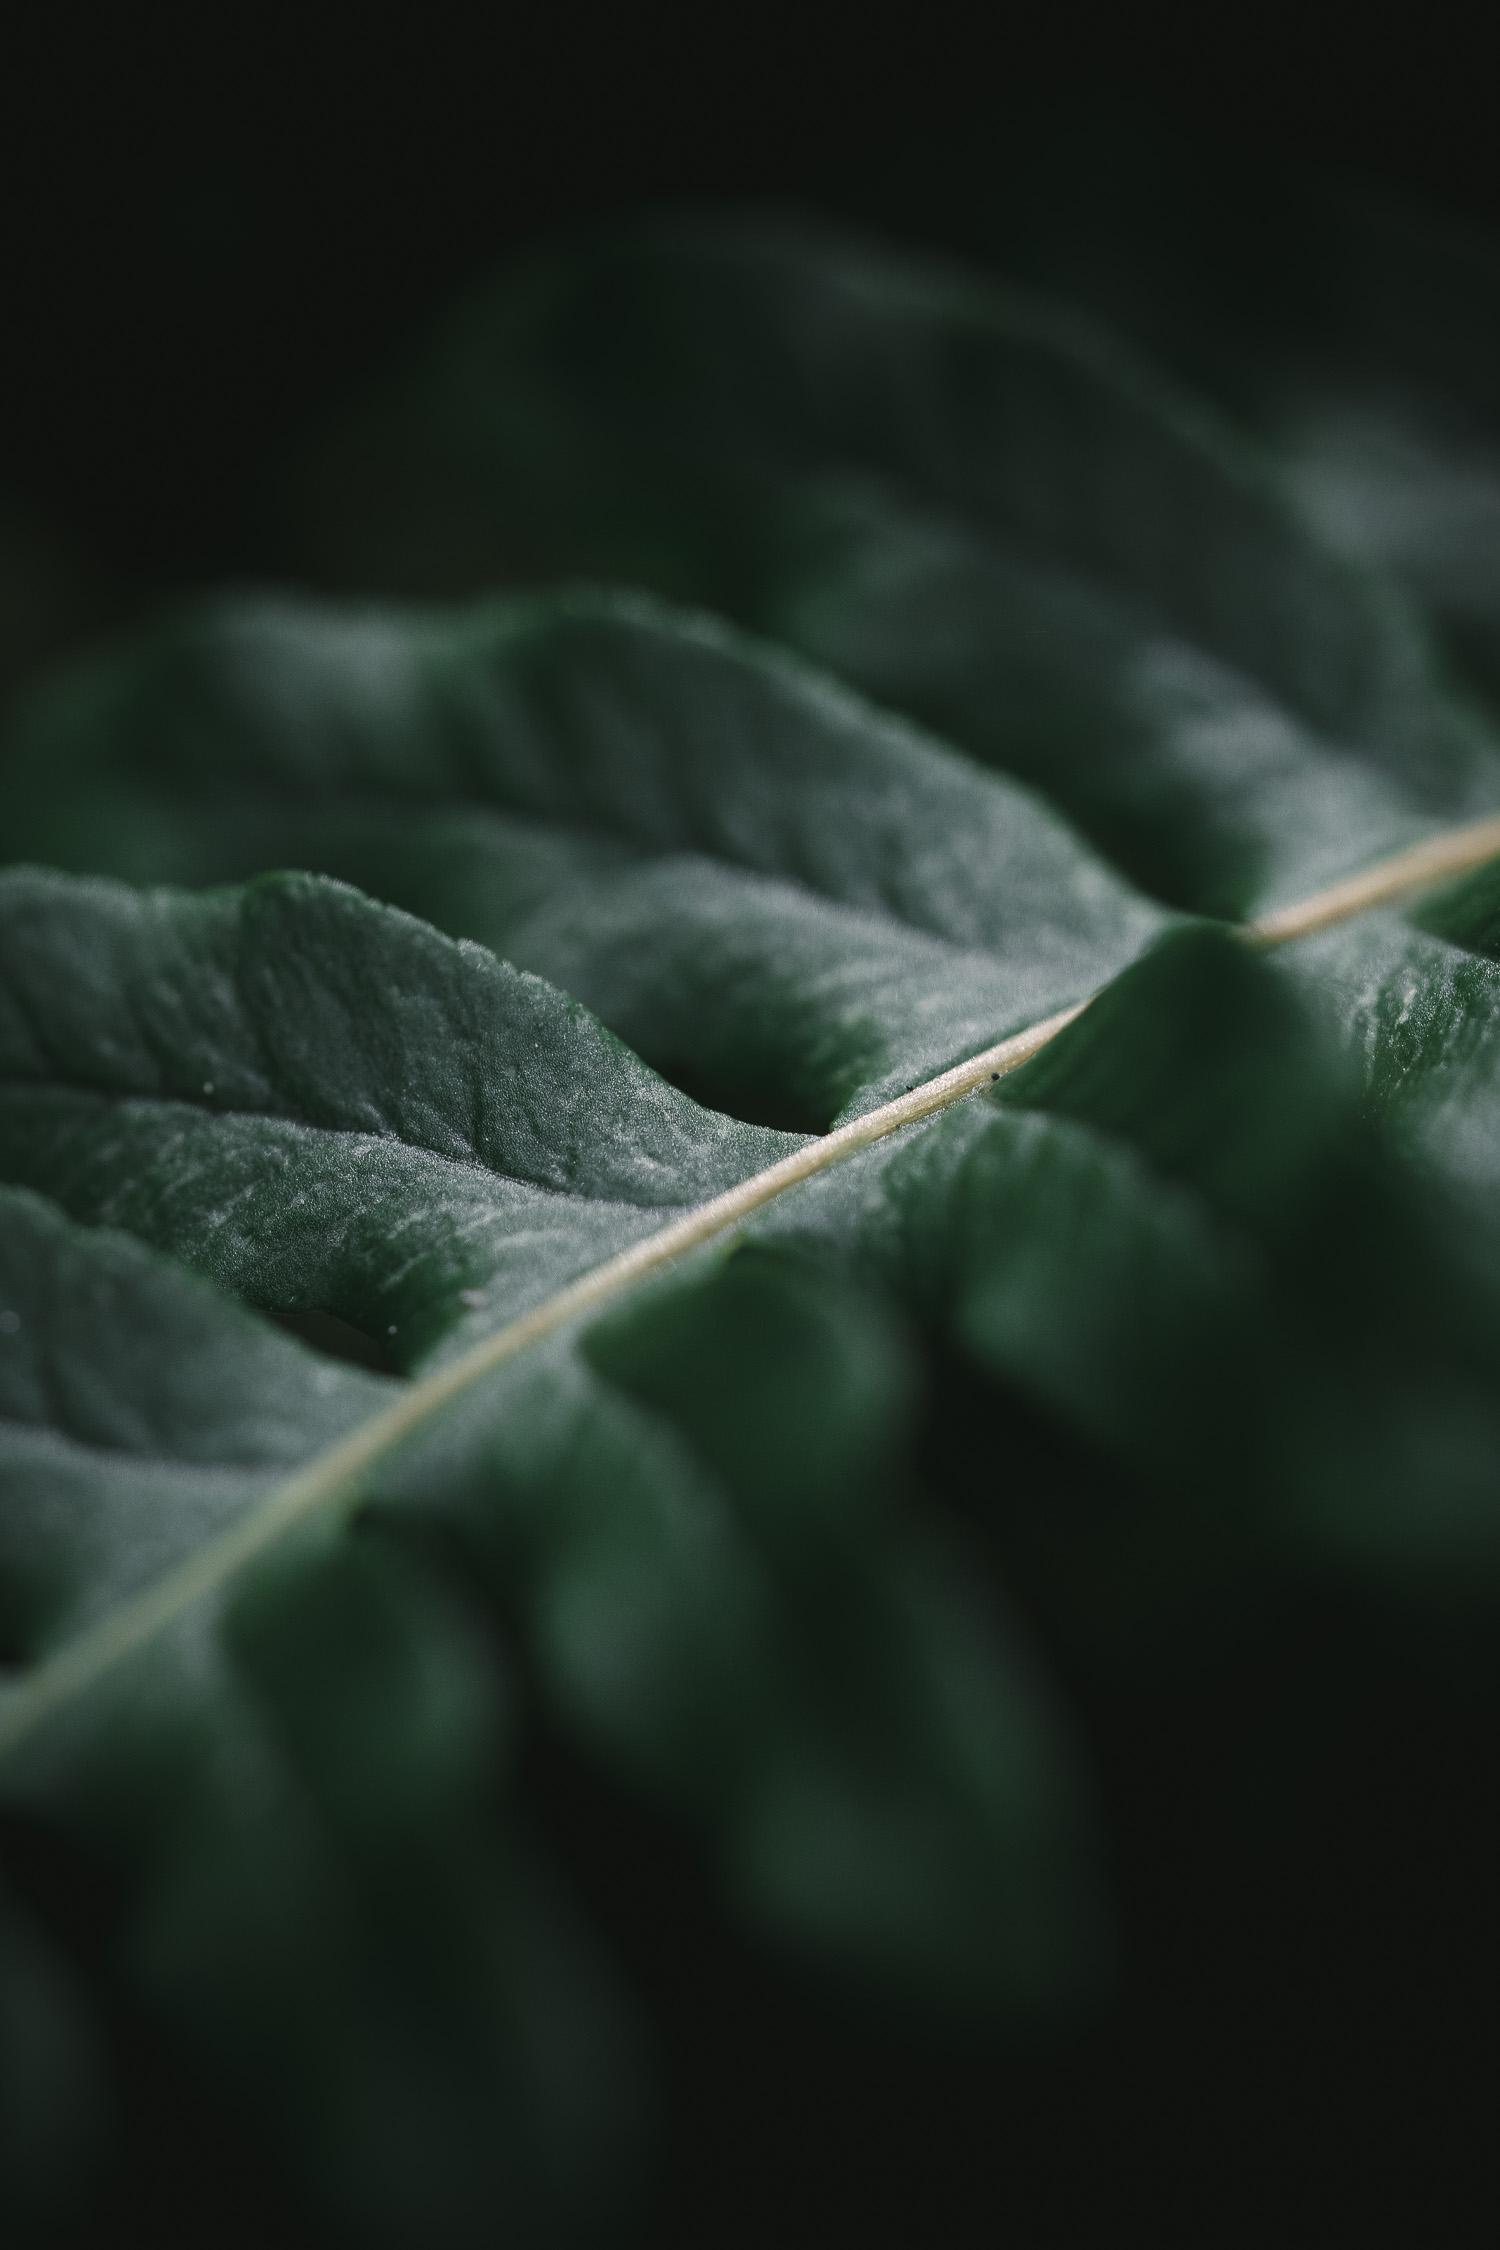 close up of a fern